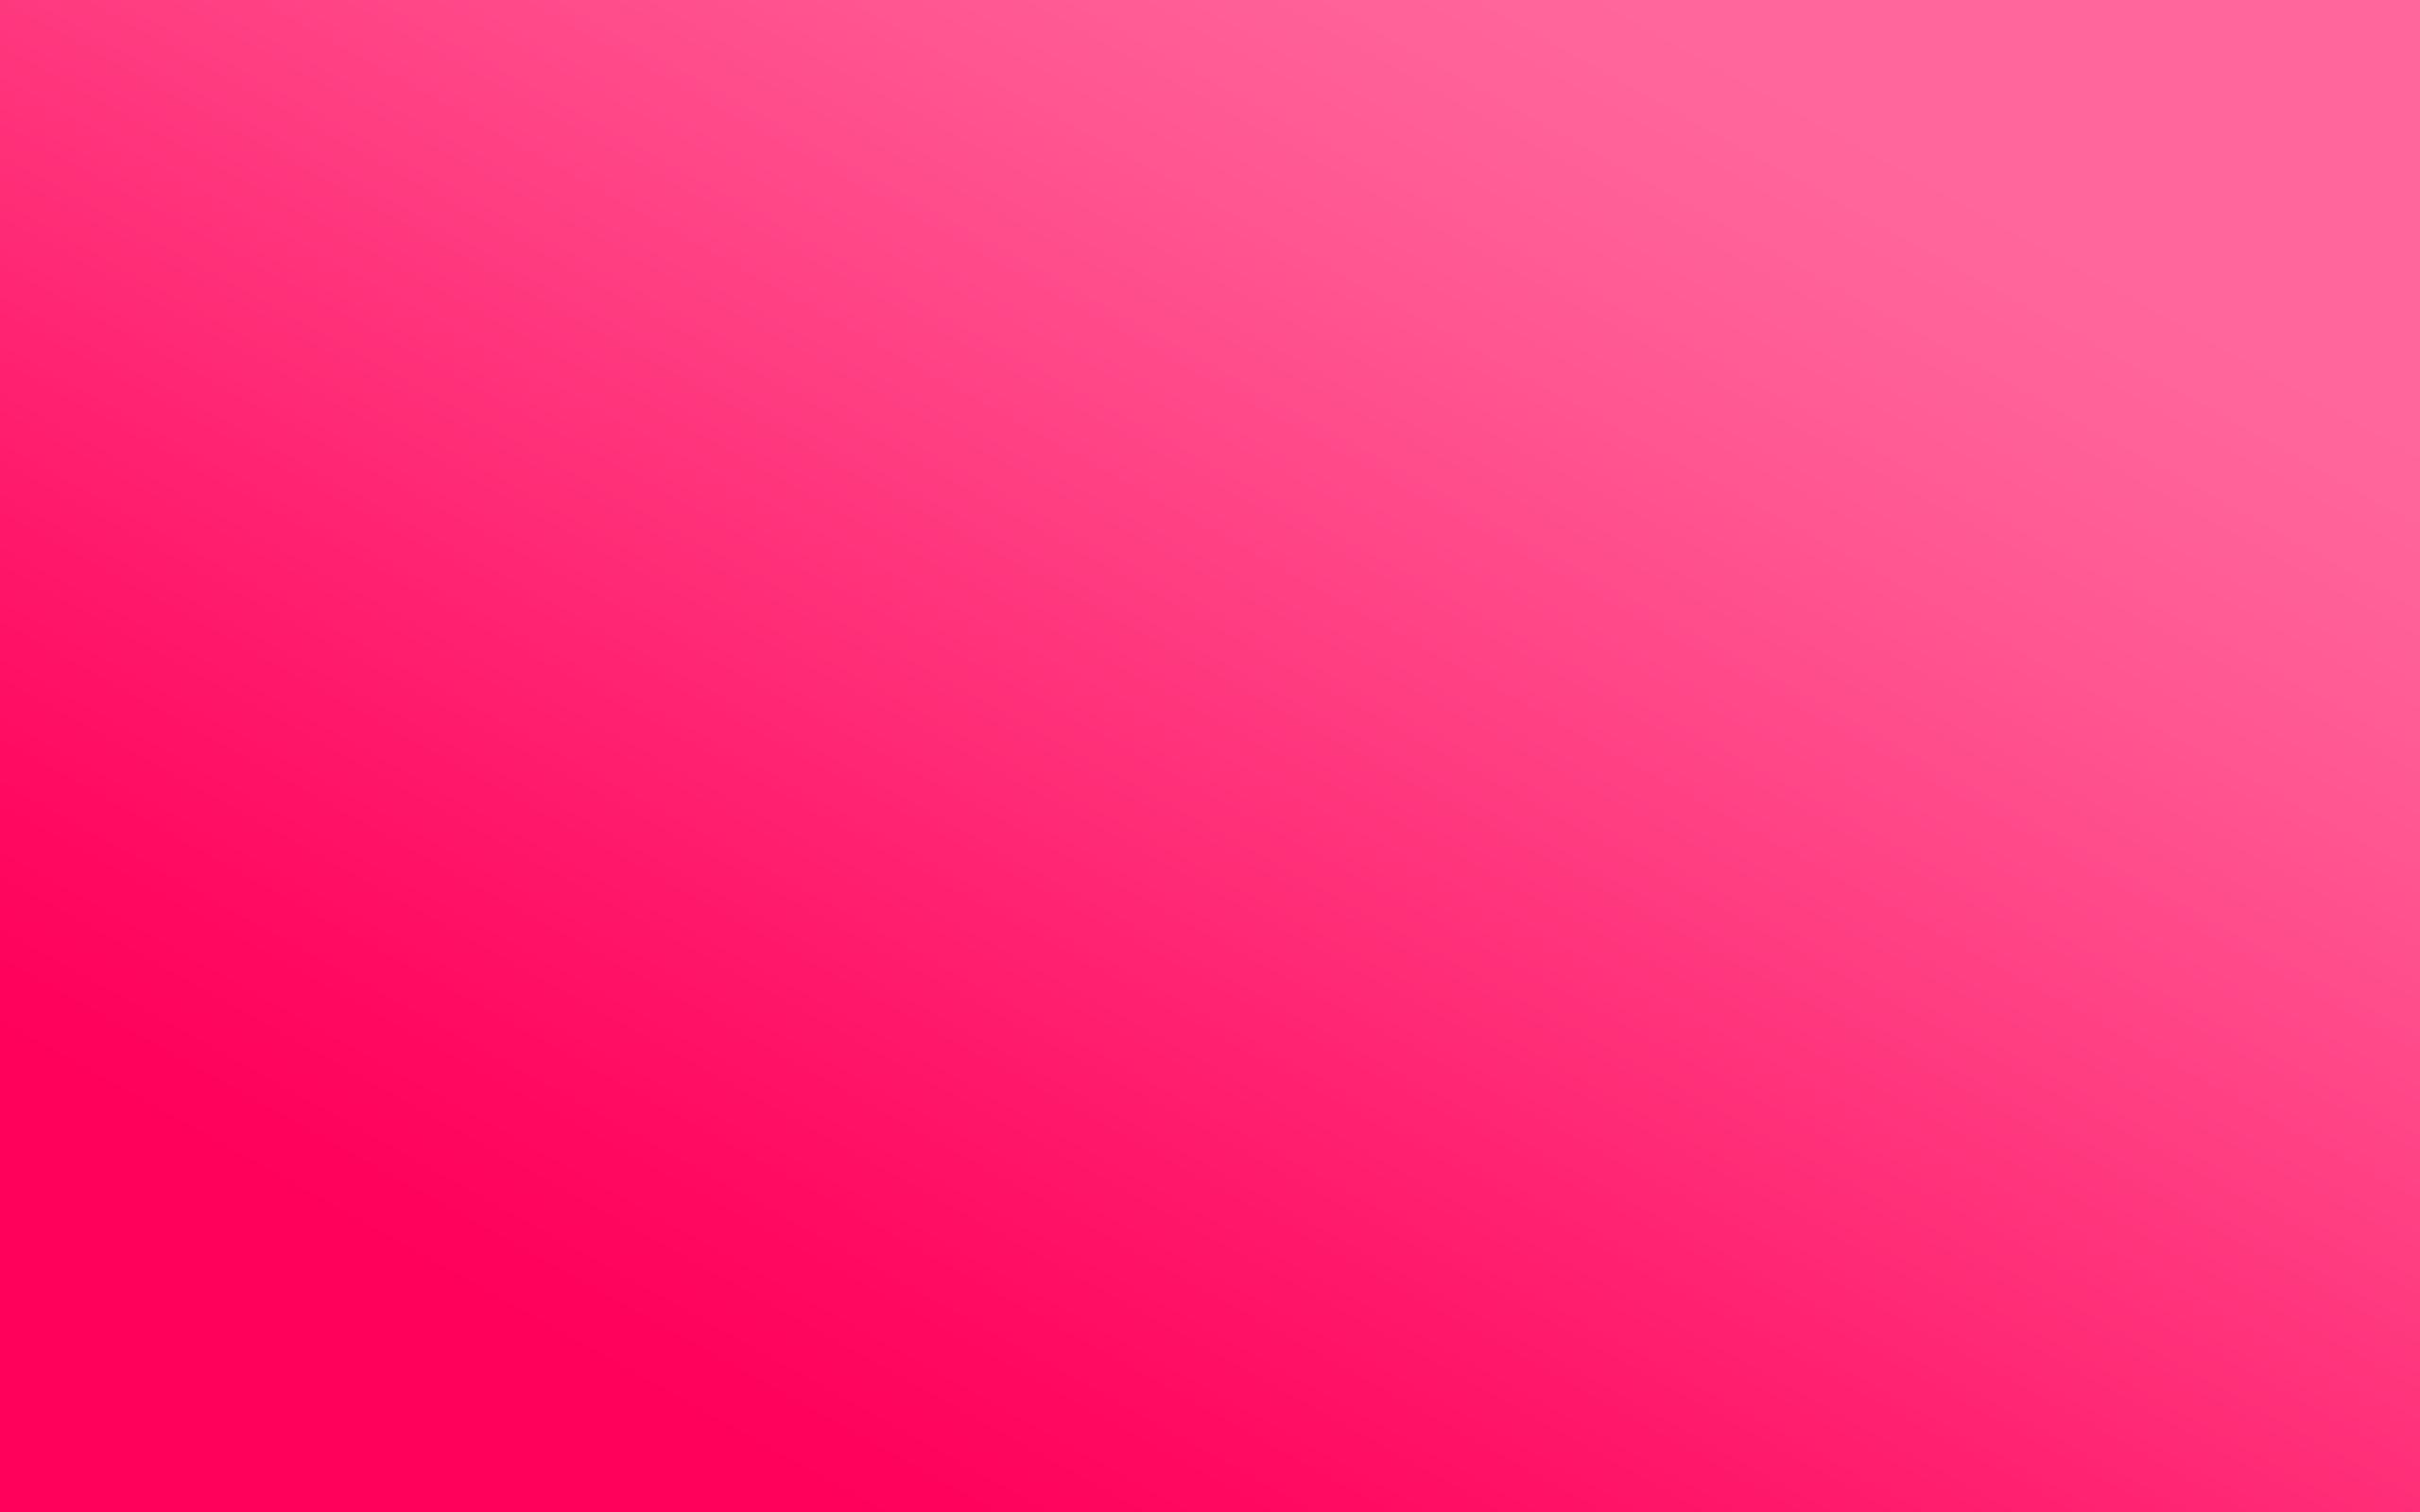 HD Background Dark Pink Solid Color Gradient Bright Light Wallpaper 2560x1600